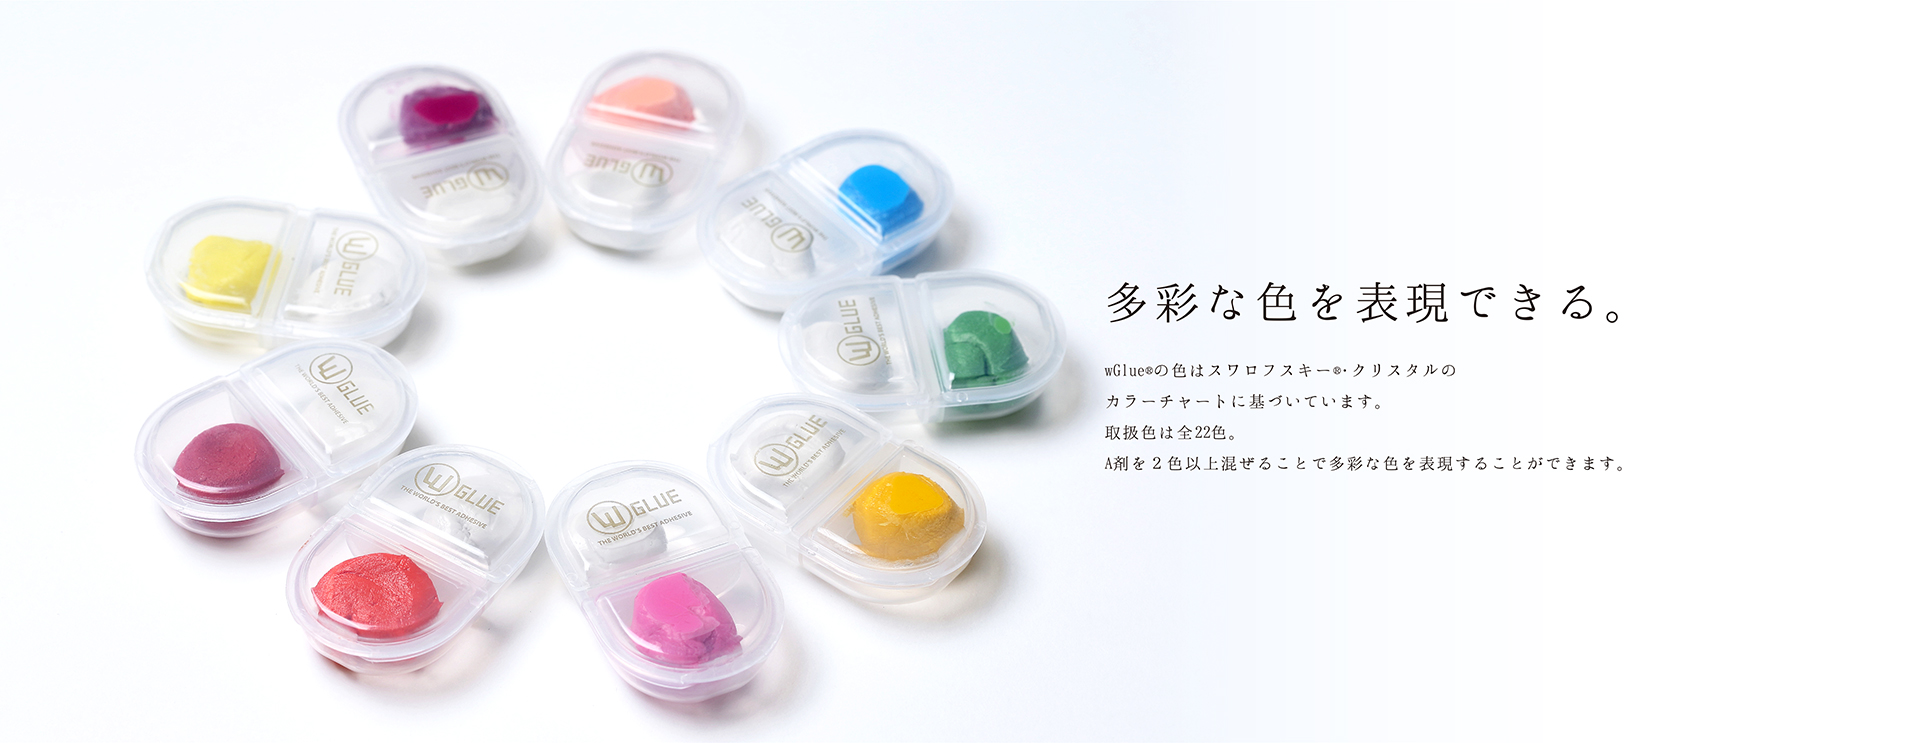 wGlue Japanイメージ2